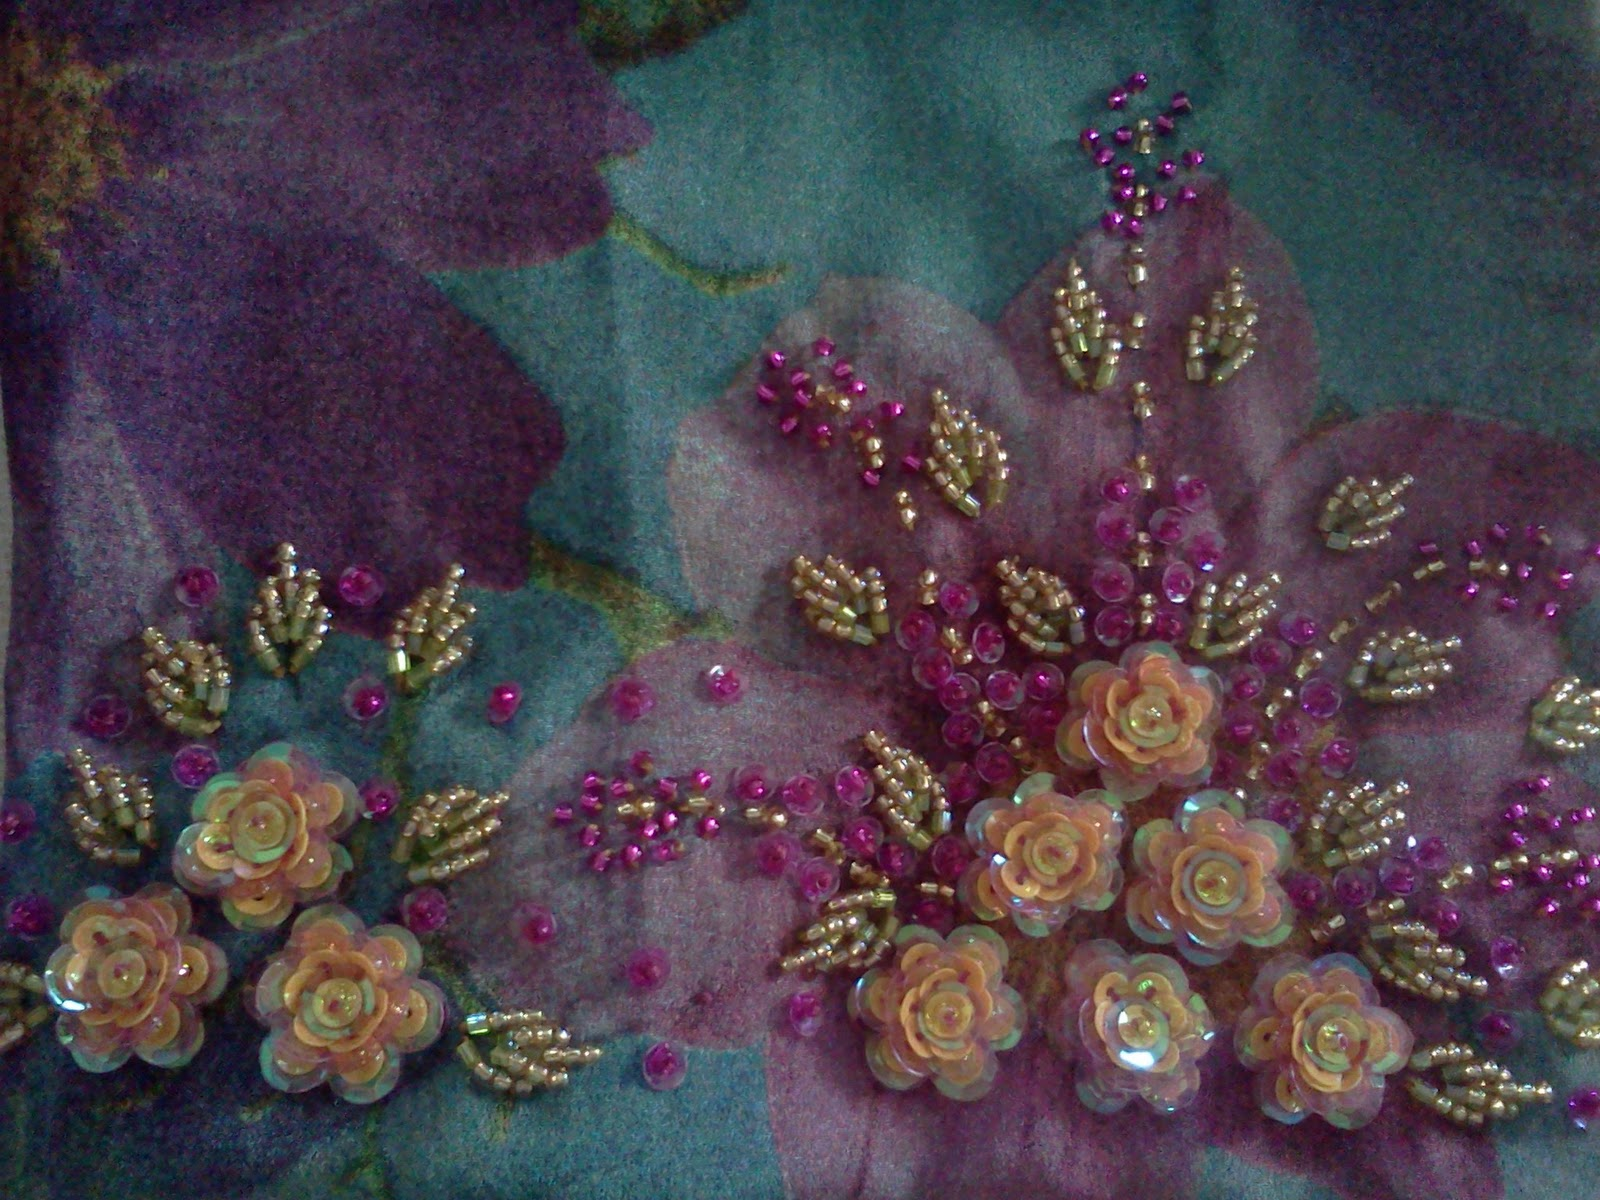 chenta manik bunga teratai